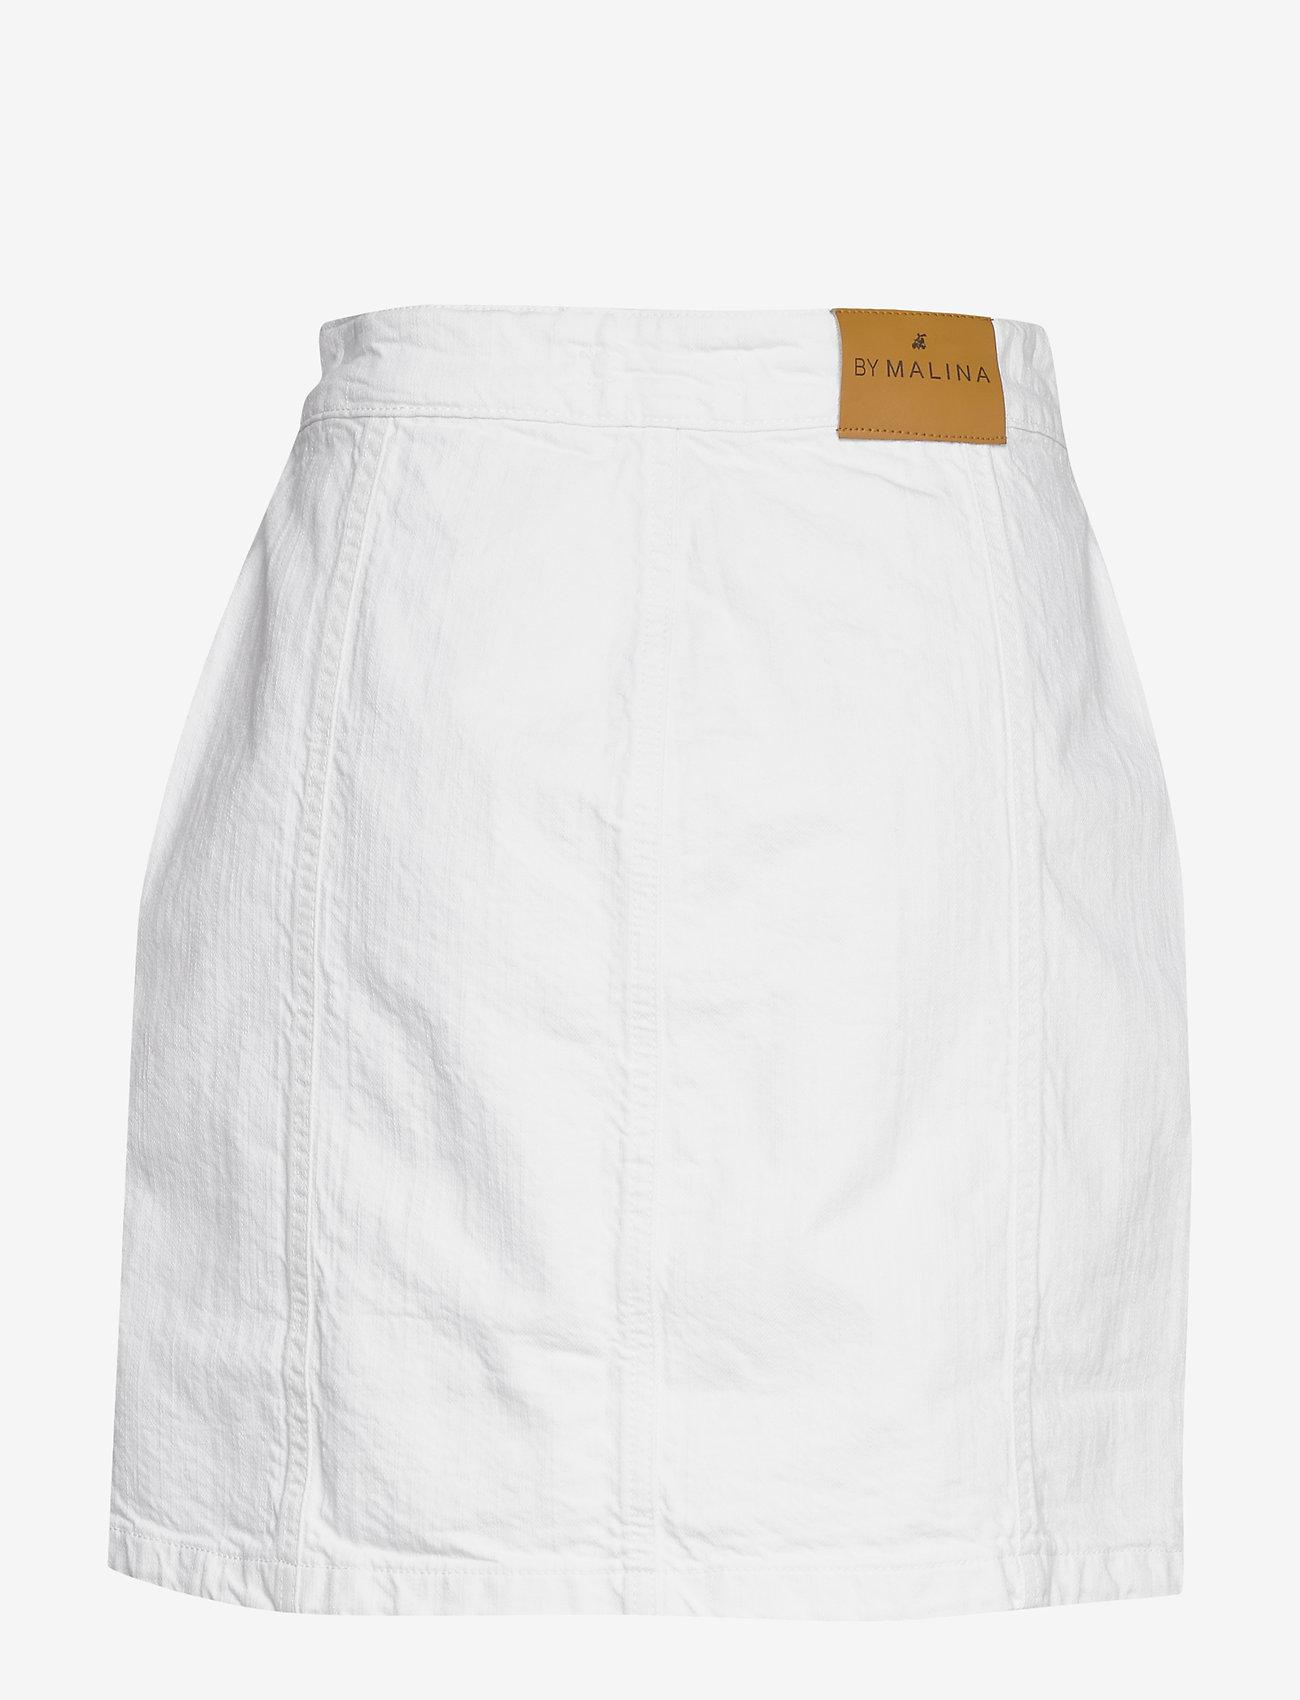 By Malina - Celie skirt - jeansowe spódnice - white - 1